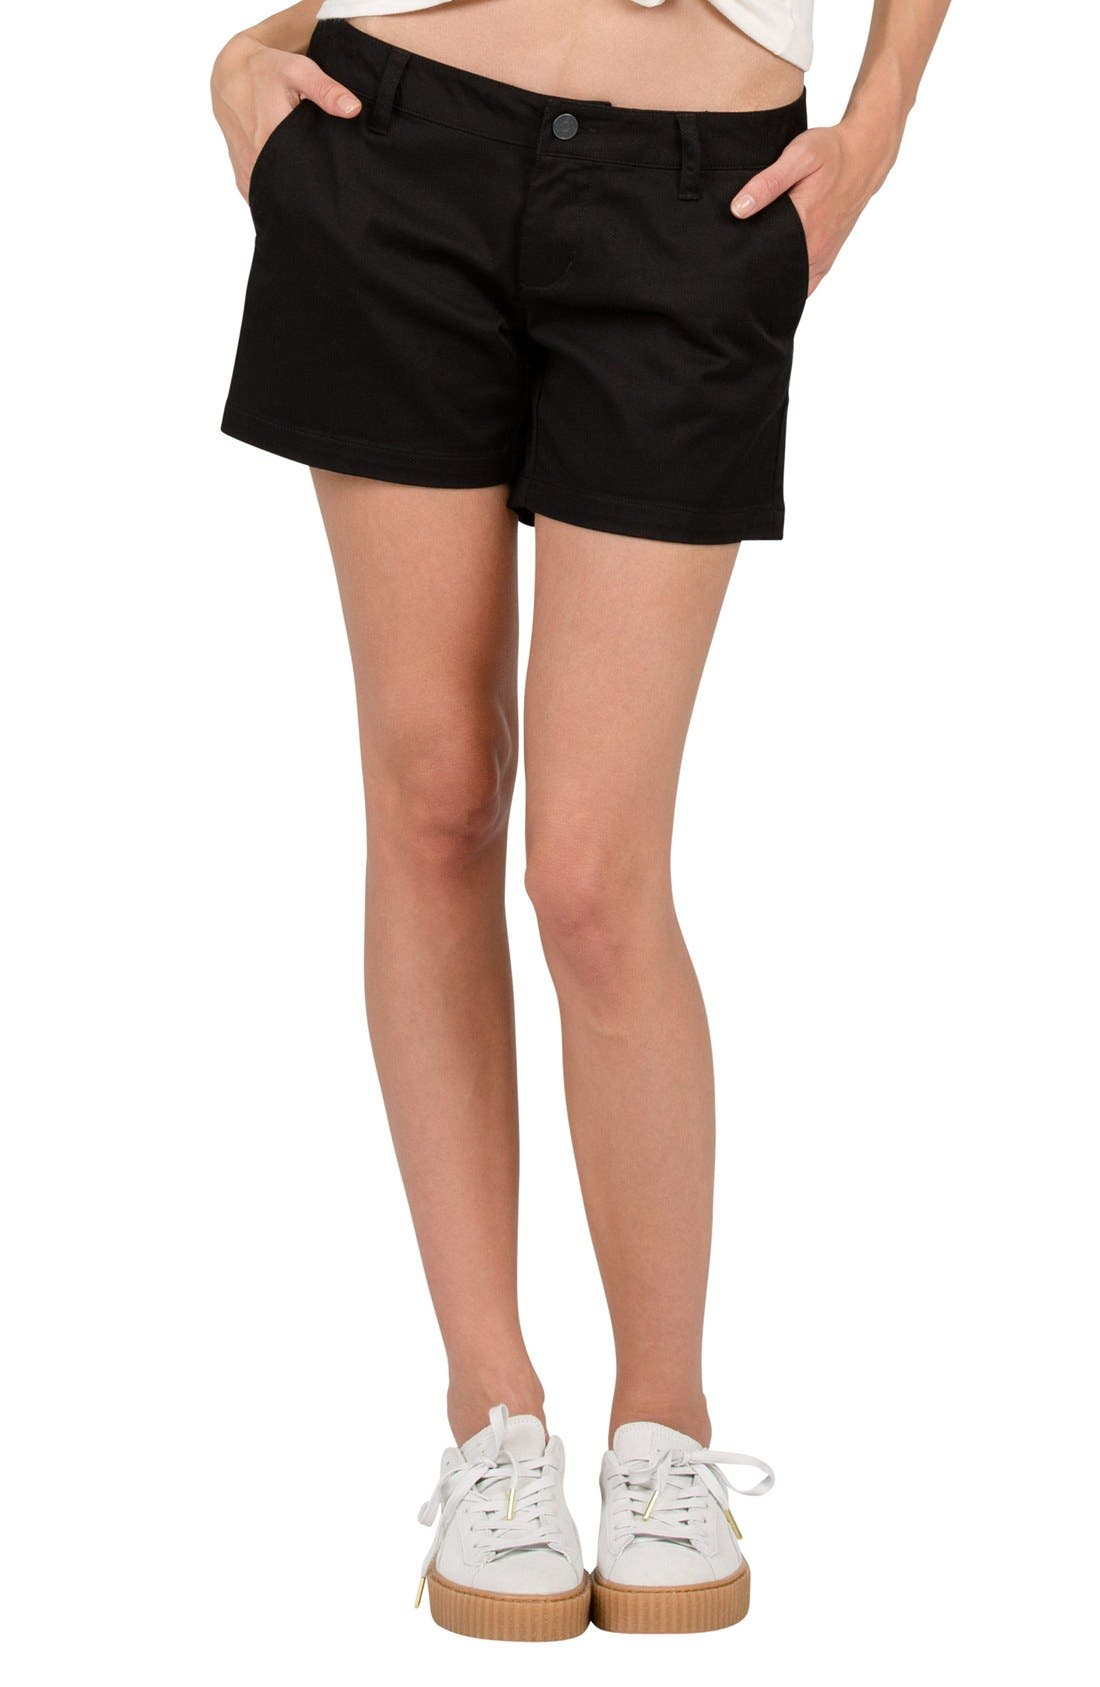 Frochickie Chino Shorts,                             Main thumbnail 1, color,                             001